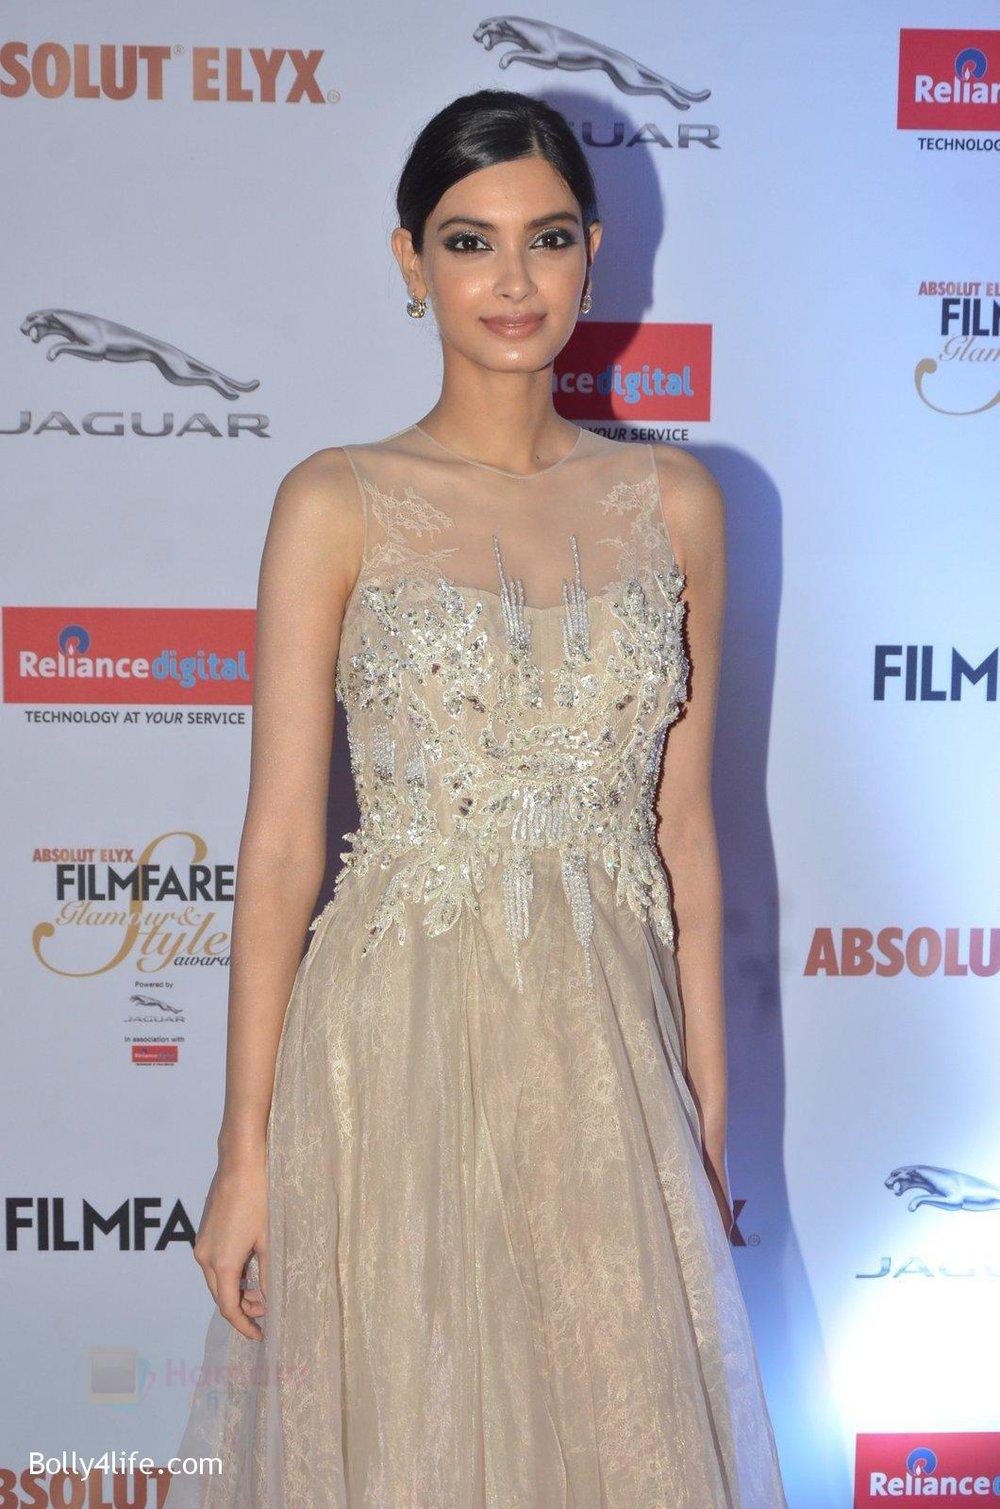 Diana-Penty-at-Filmfare-Glamour-Style-Awards-2016-in-Mumbai-on-15th-Oct-2016-1797.jpg